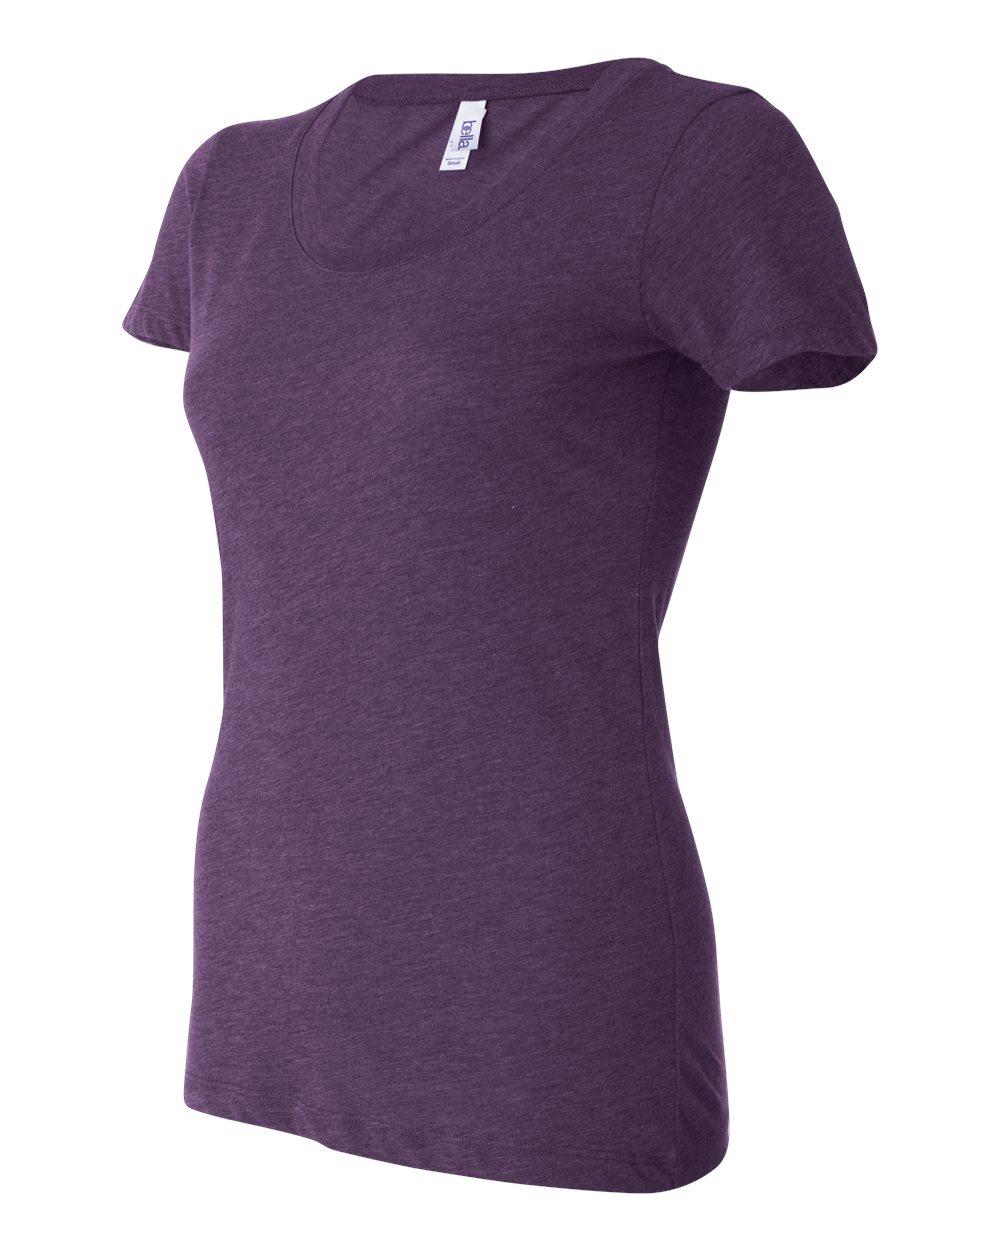 Bella 8413 Purple Triblend